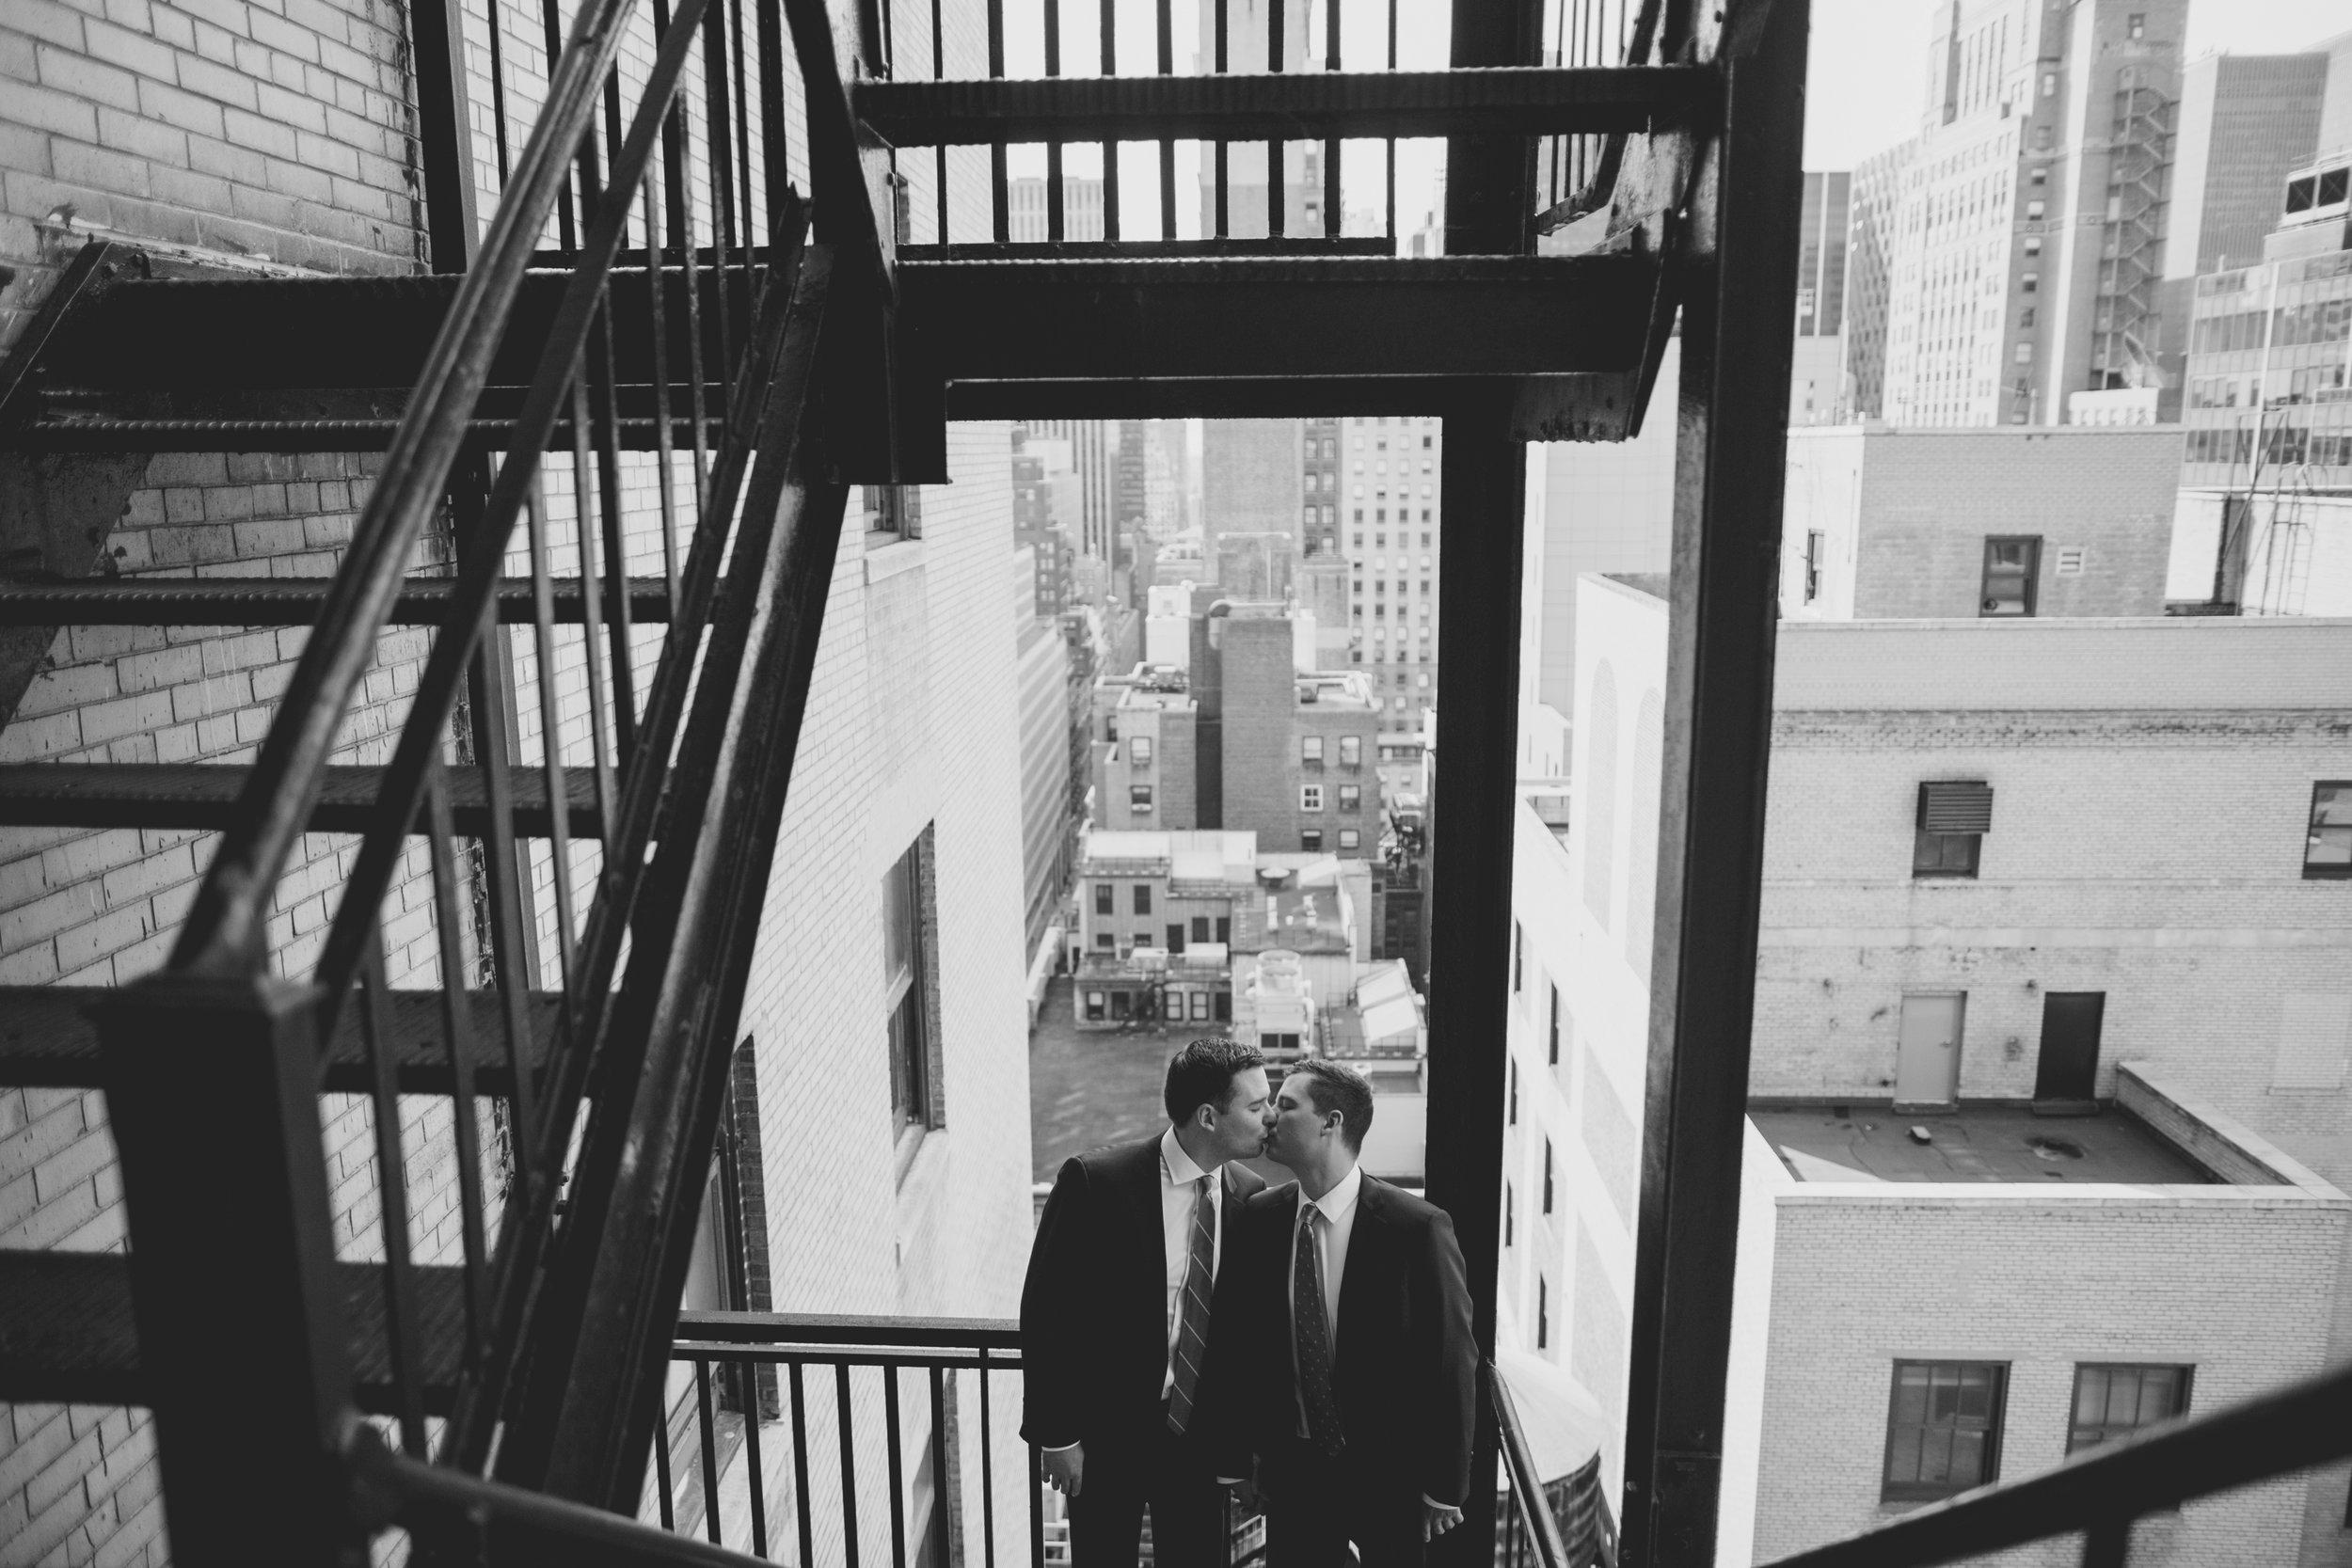 amanda_vanvels_new_york_lgbtq_gay_wedding_032.jpg